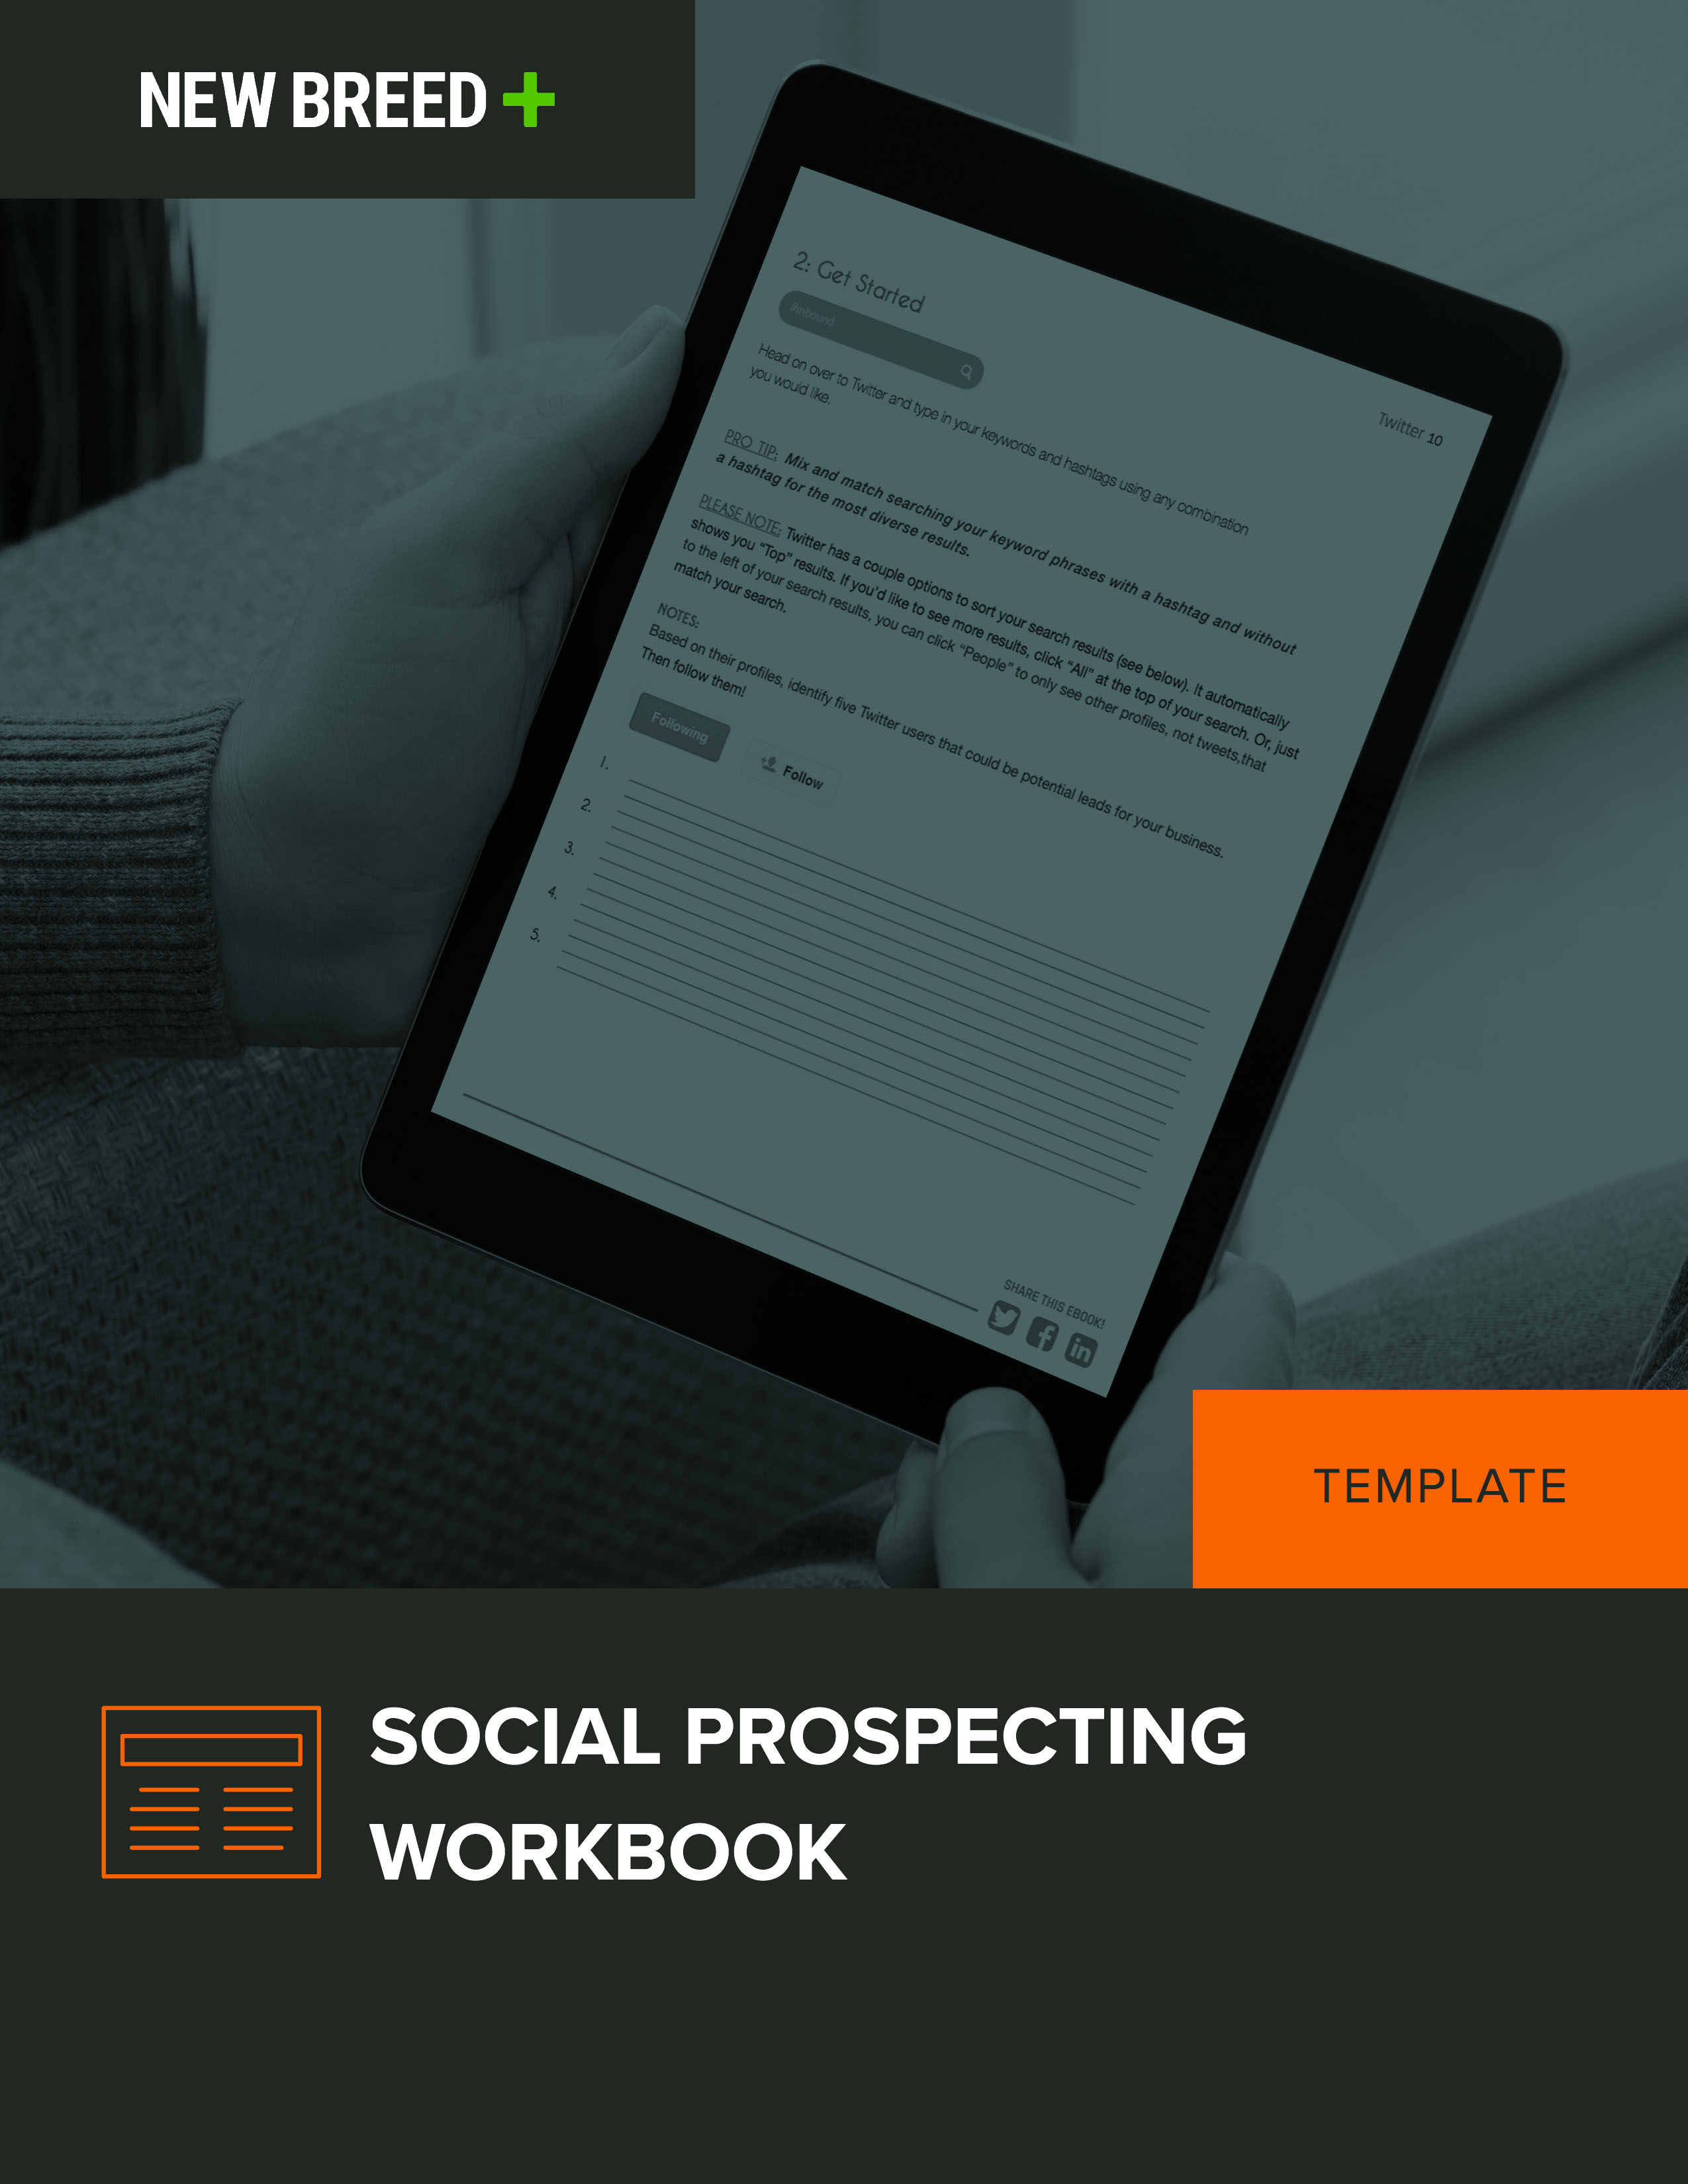 social prospecting workbook